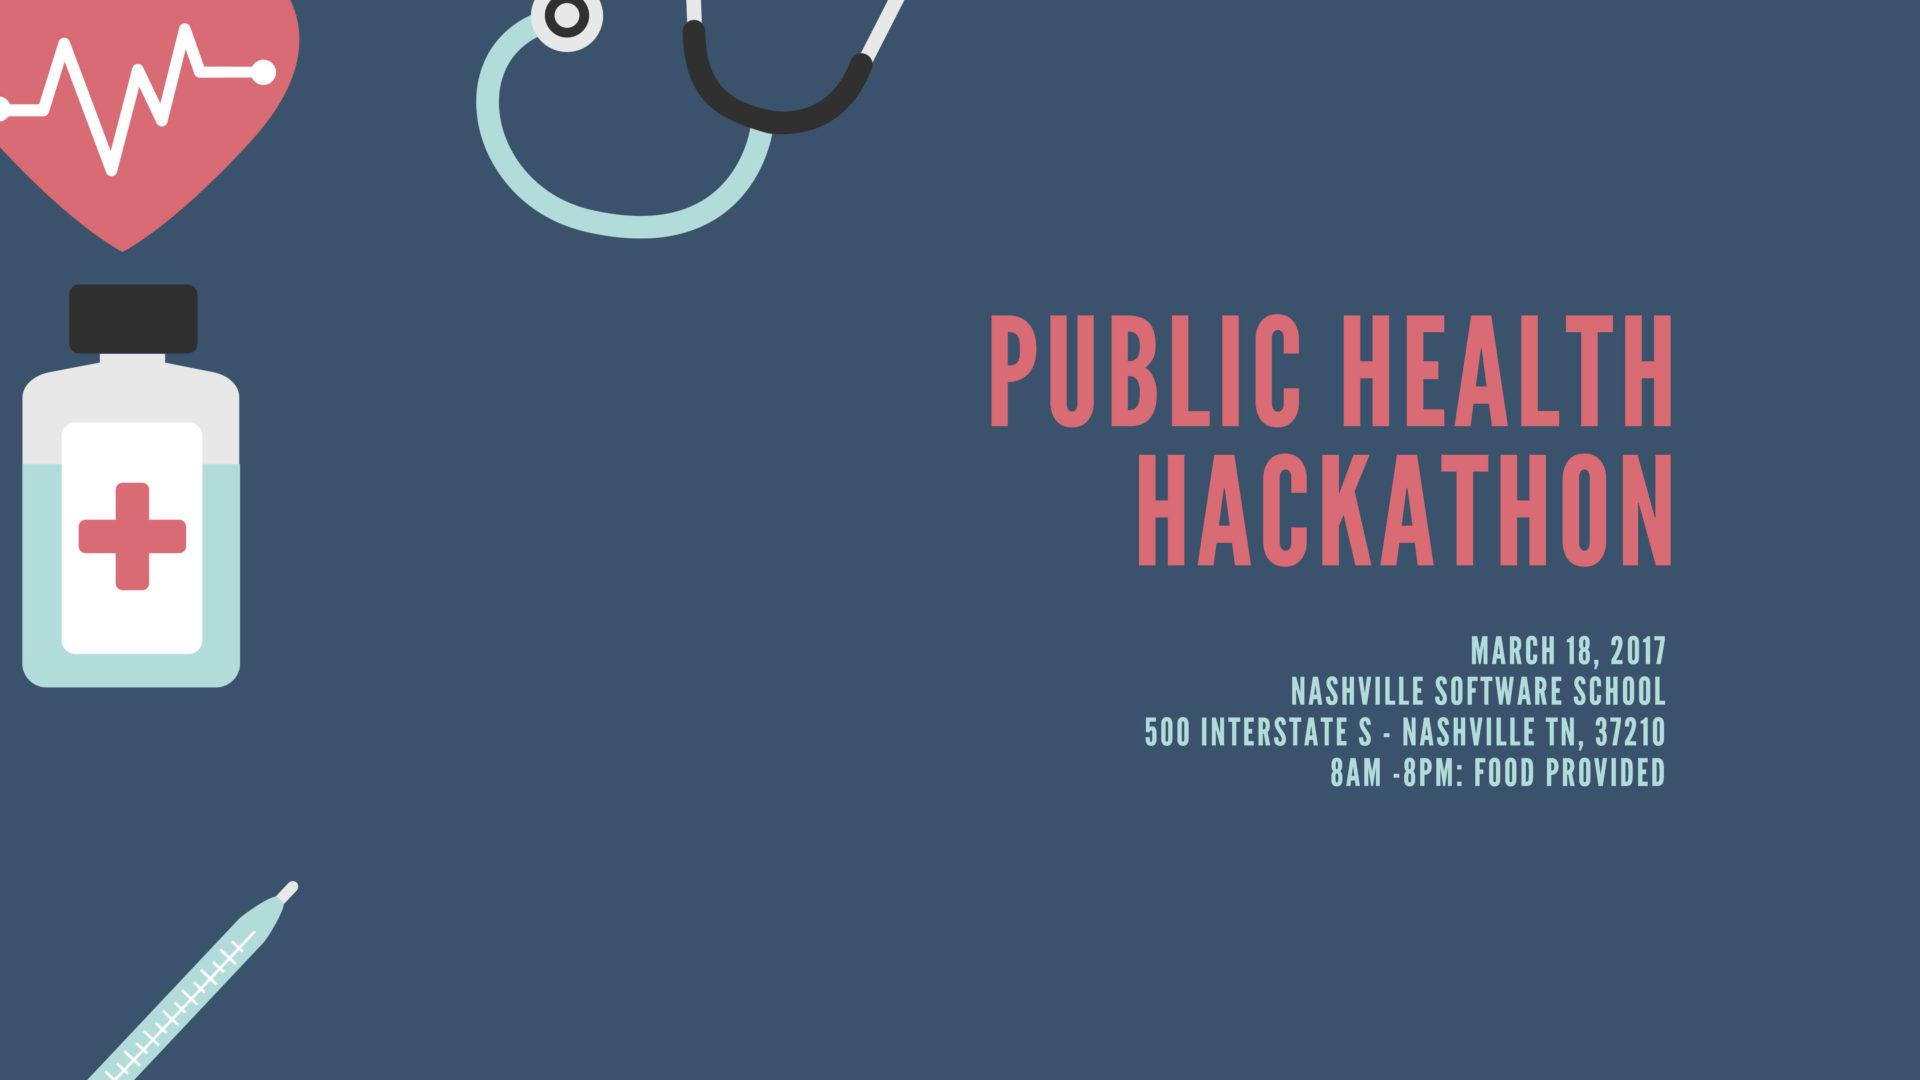 Community Mapping Public Health Hackathon